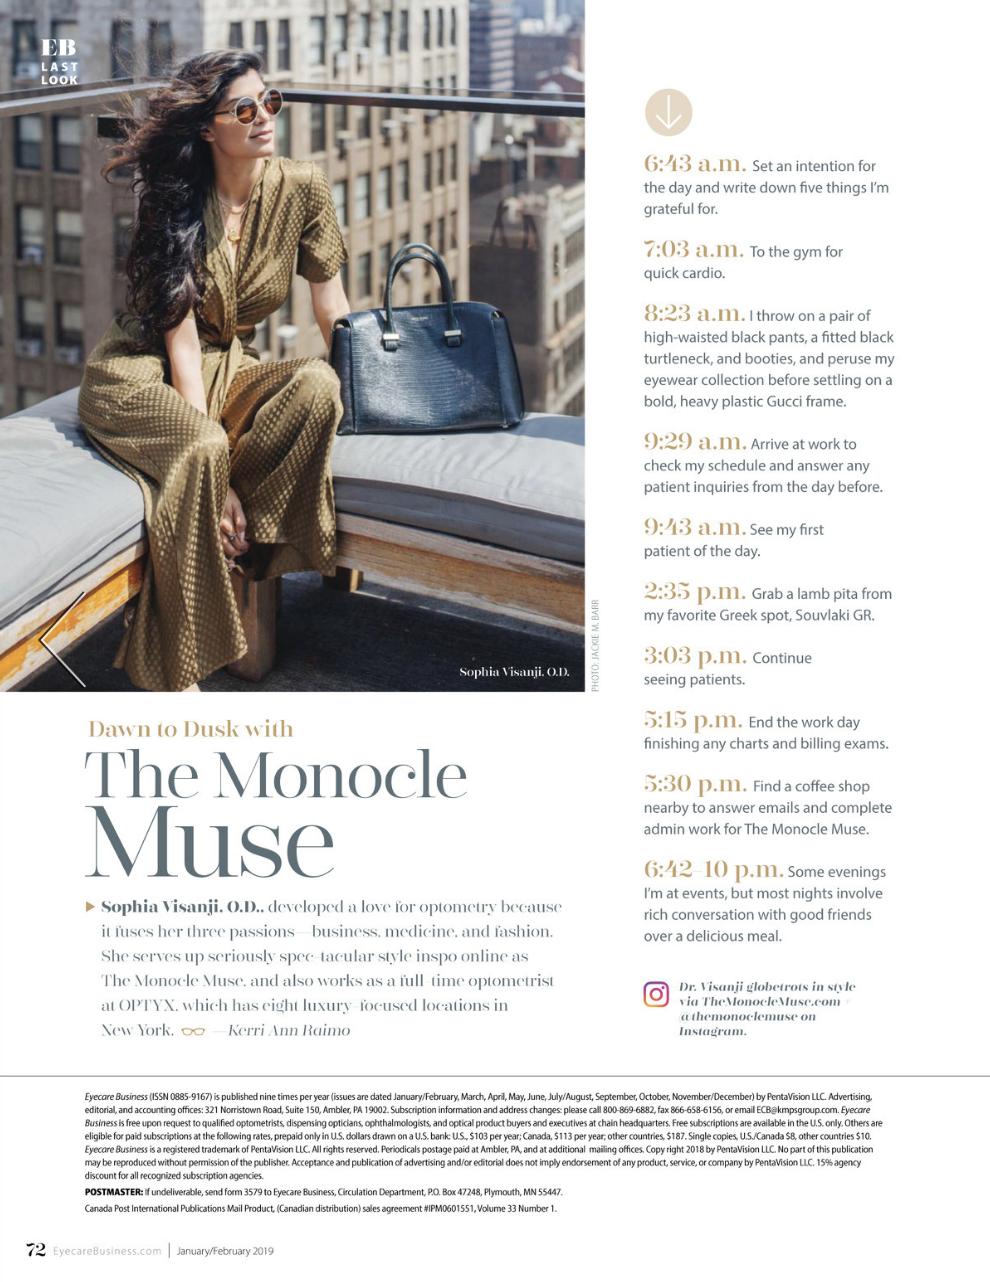 Eyecare Business Magazine feature, January/February 2019 issue